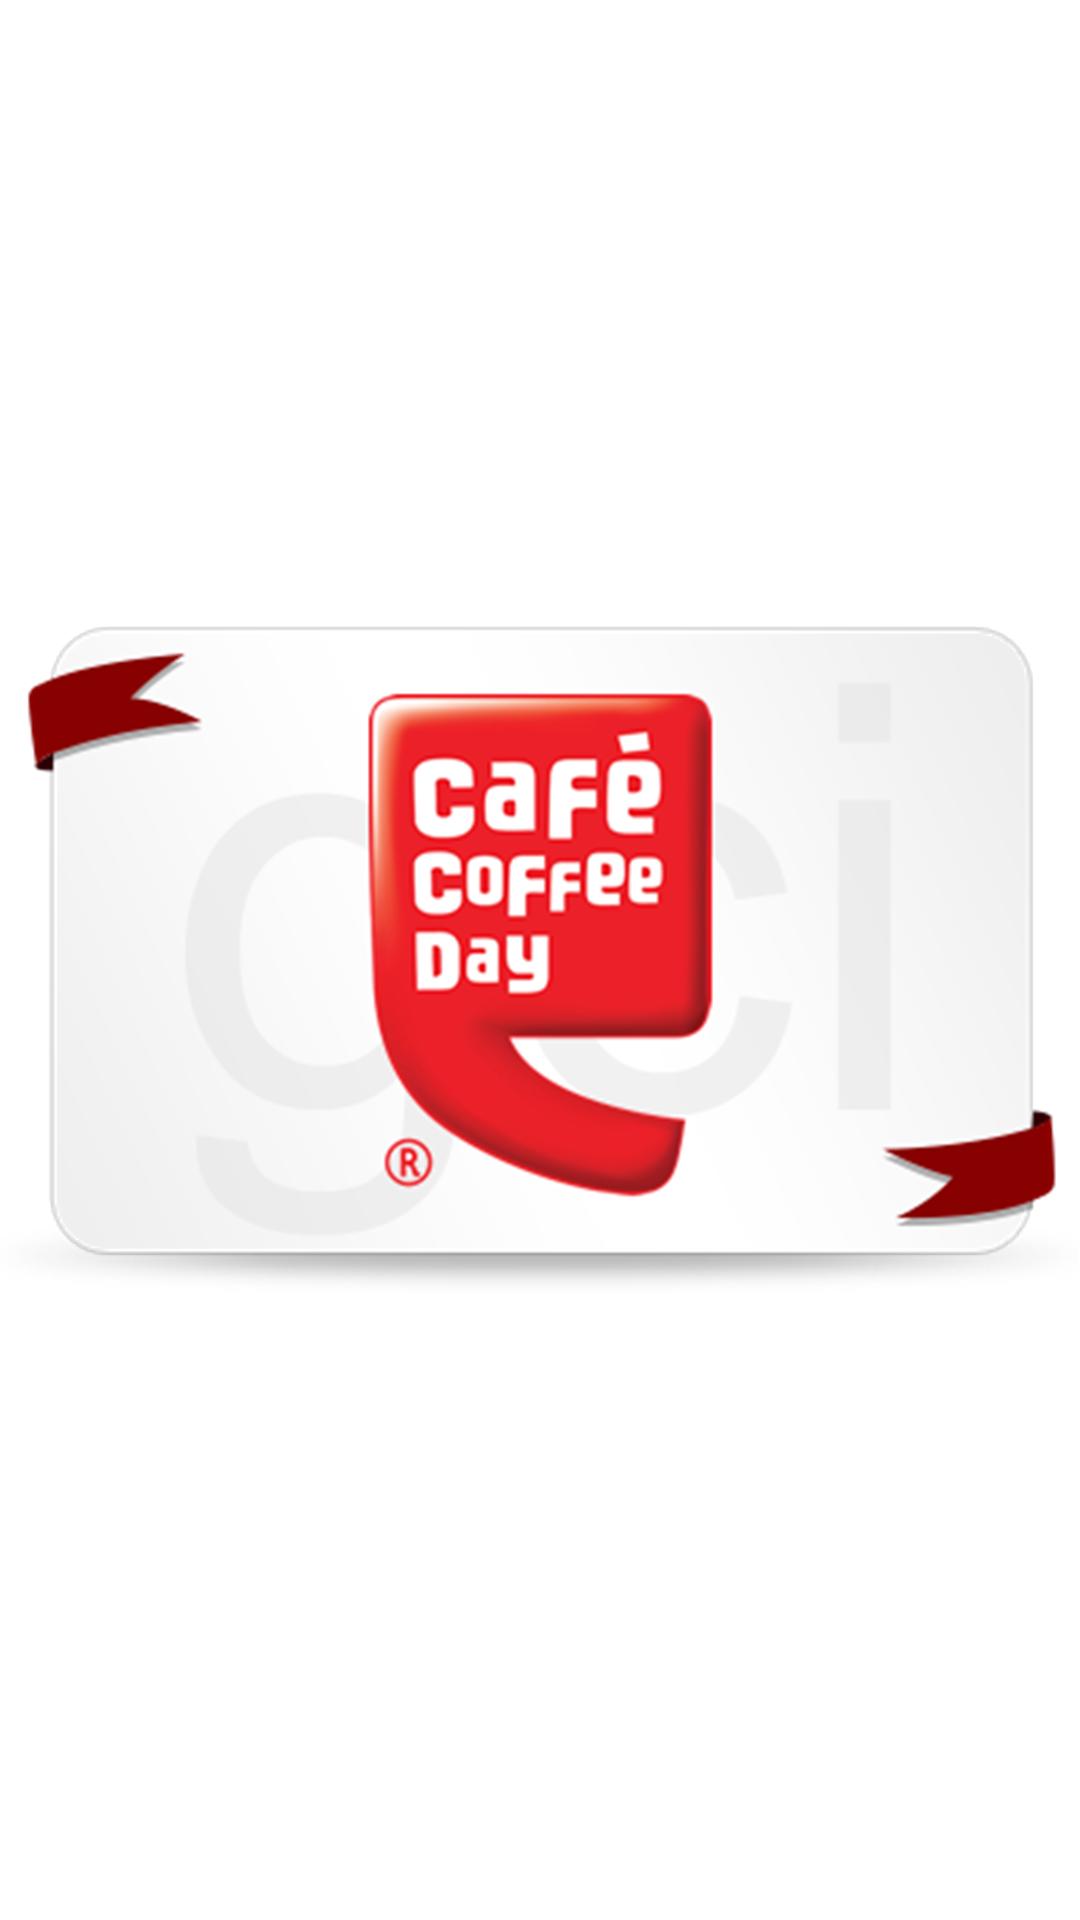 https://assetscdn1.paytm.com/images/catalog/product/C/CM/CMPLXGIFCAFE-COFFEE-GCI-381117CB70BF0/0x1920/70/0.png